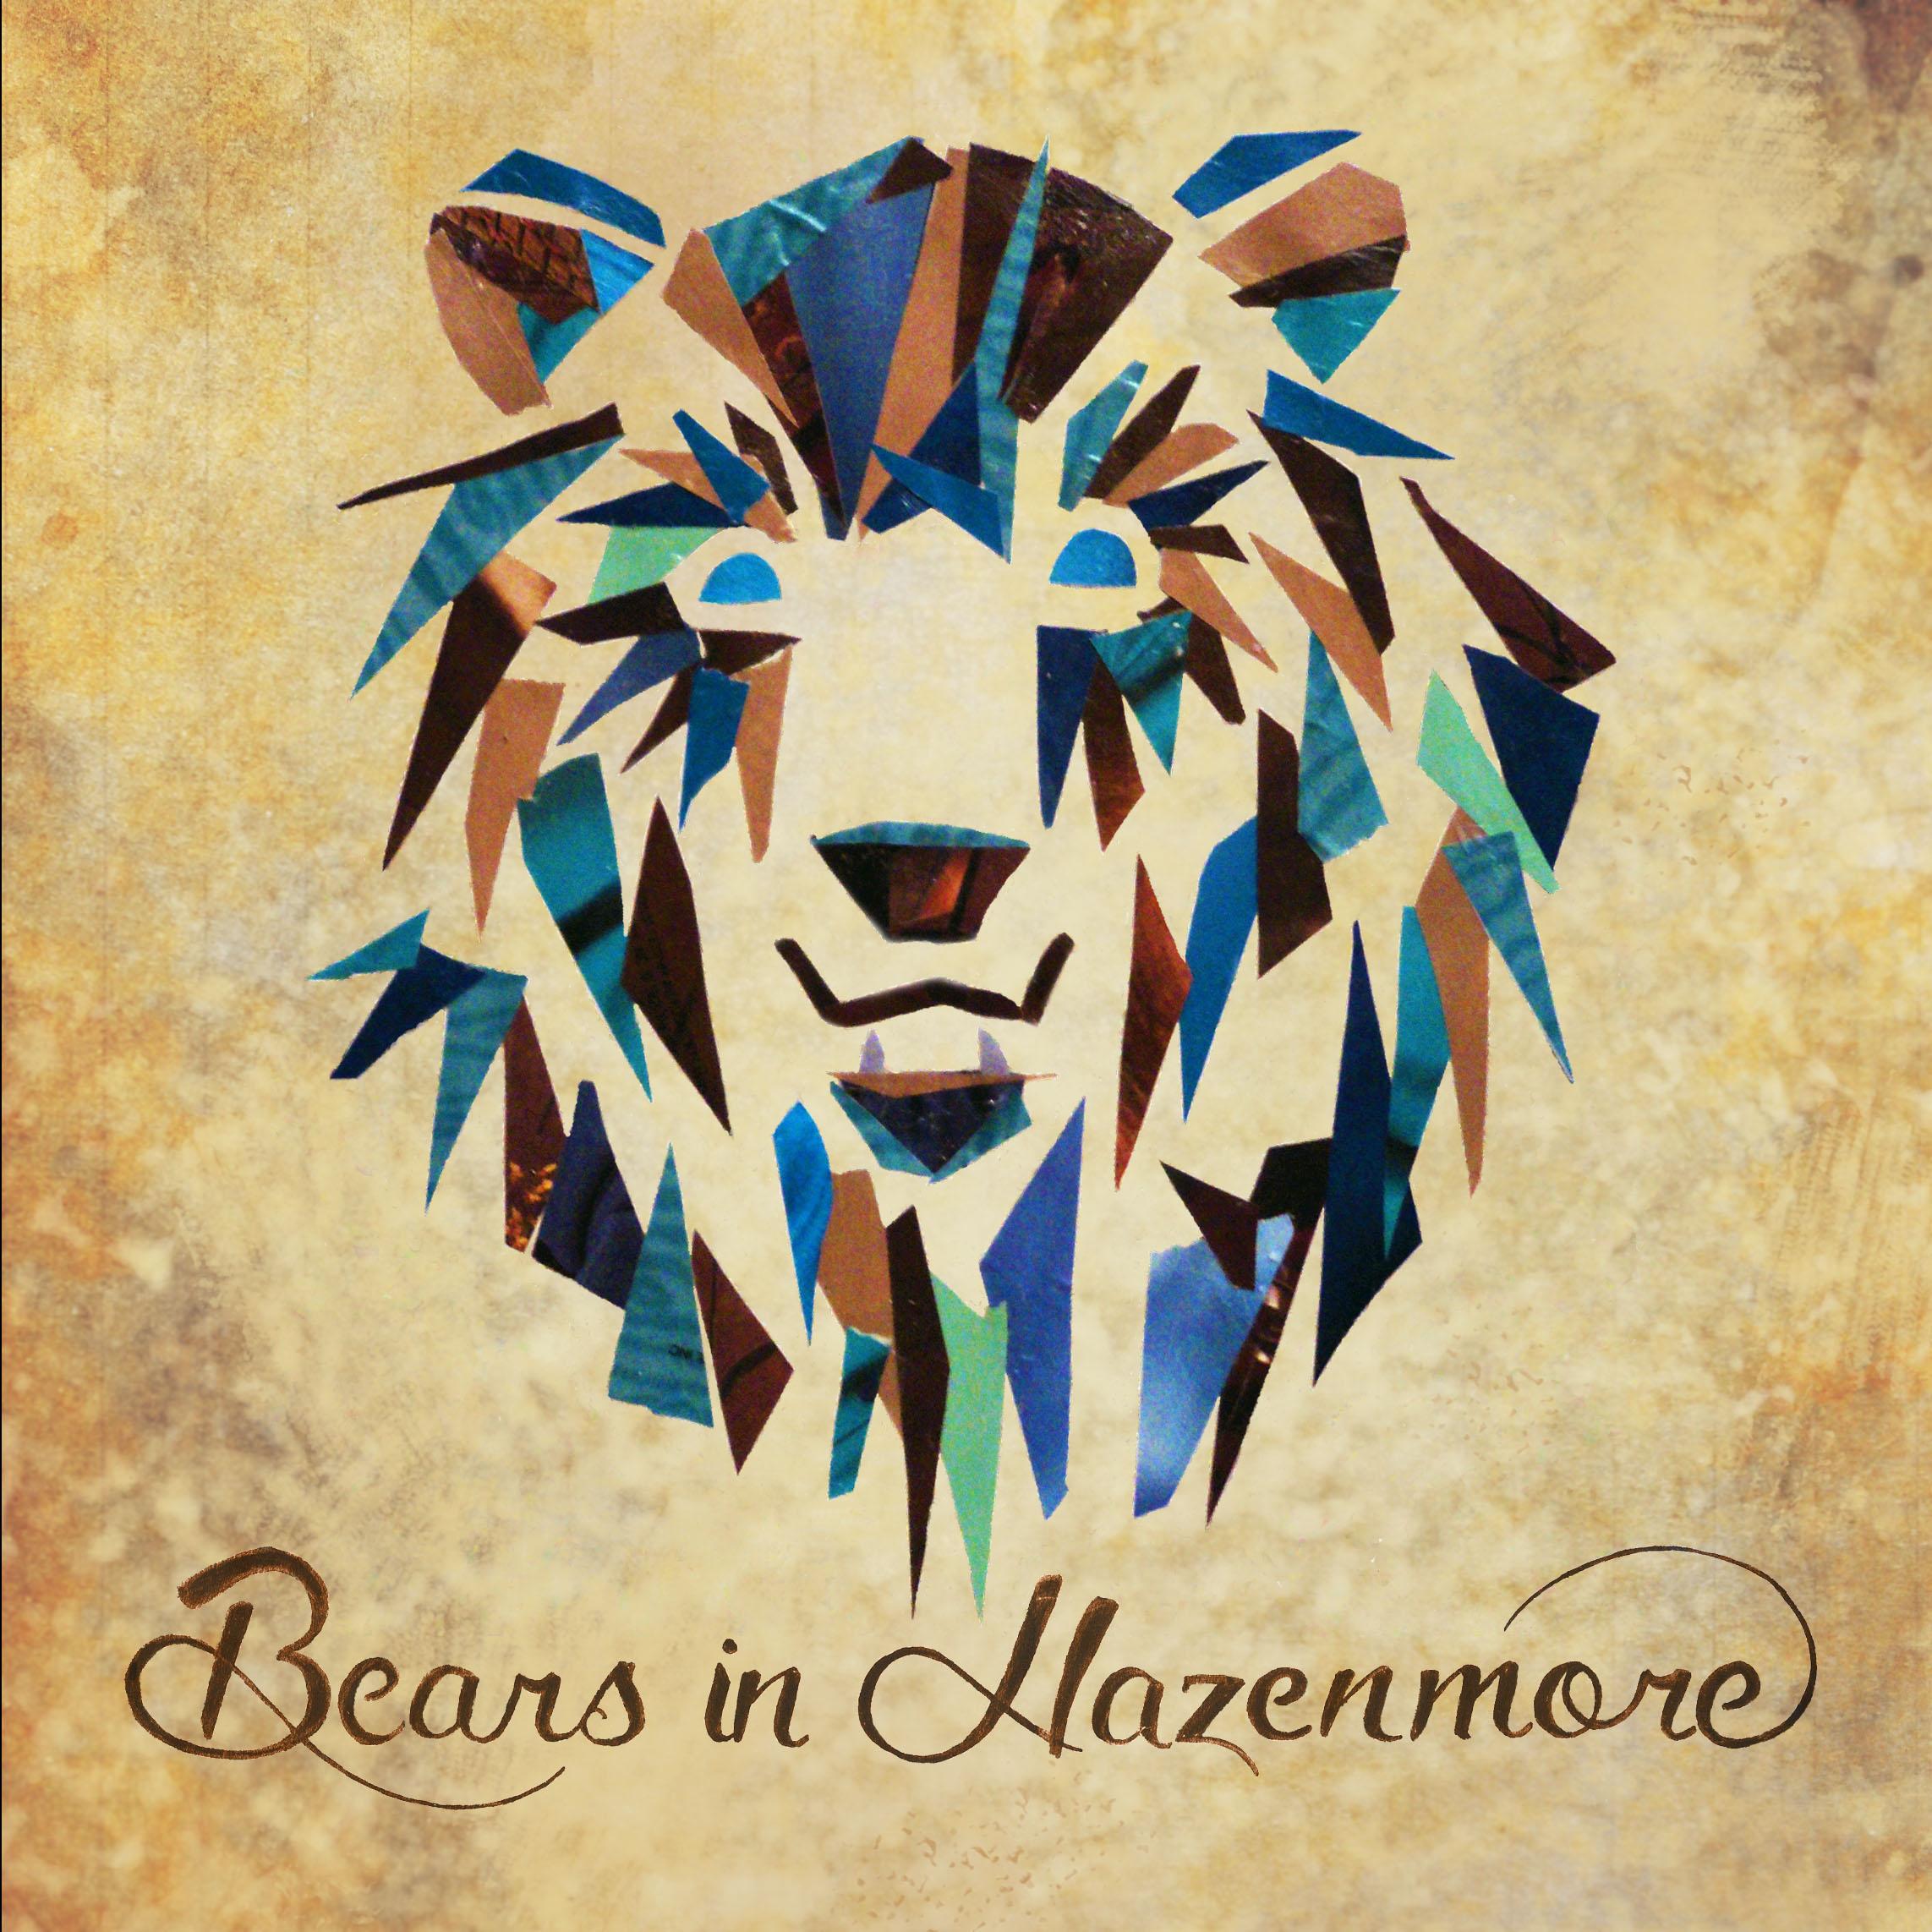 2014 Bears in Hazenmore EP Front Cover.jpg